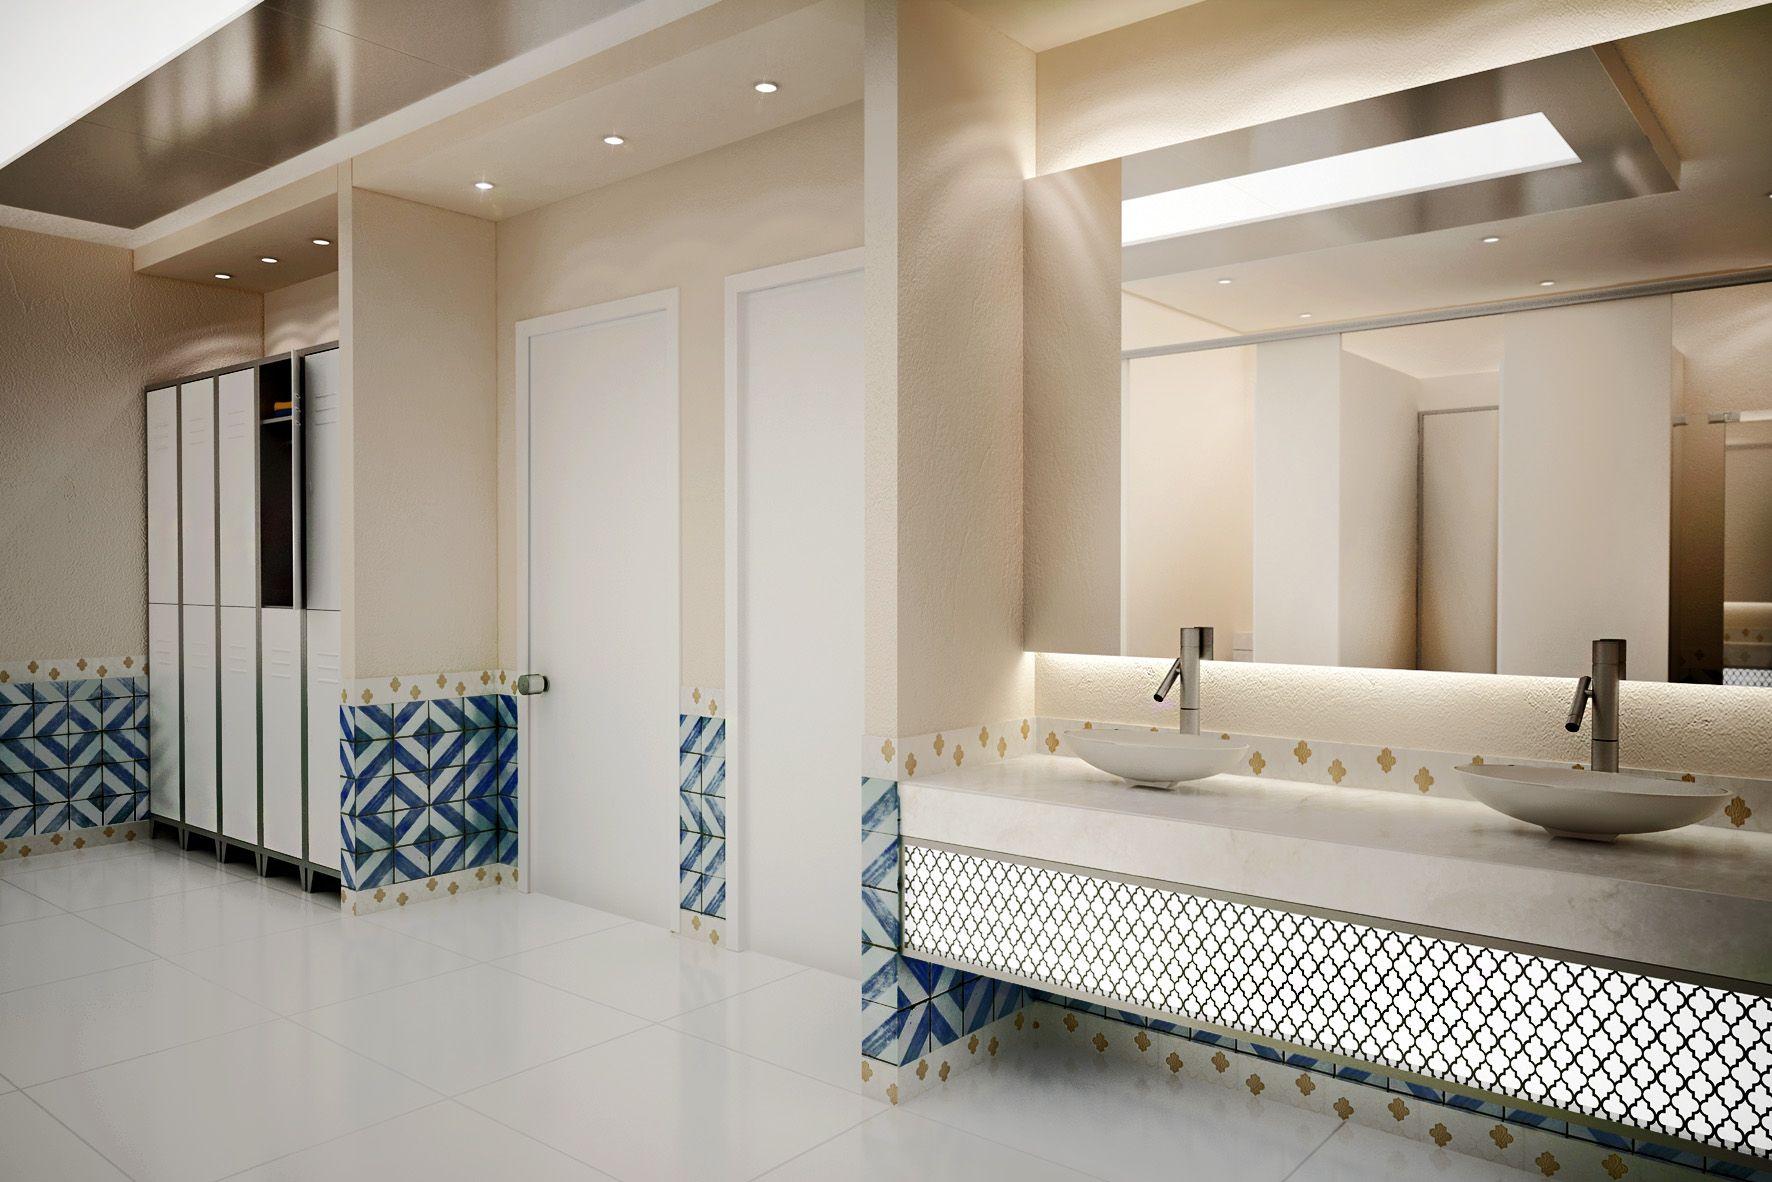 Gym Bathroom Designs Unique Gym Bathroom Moroccan Style Morocco Design Modern Design Inspiration